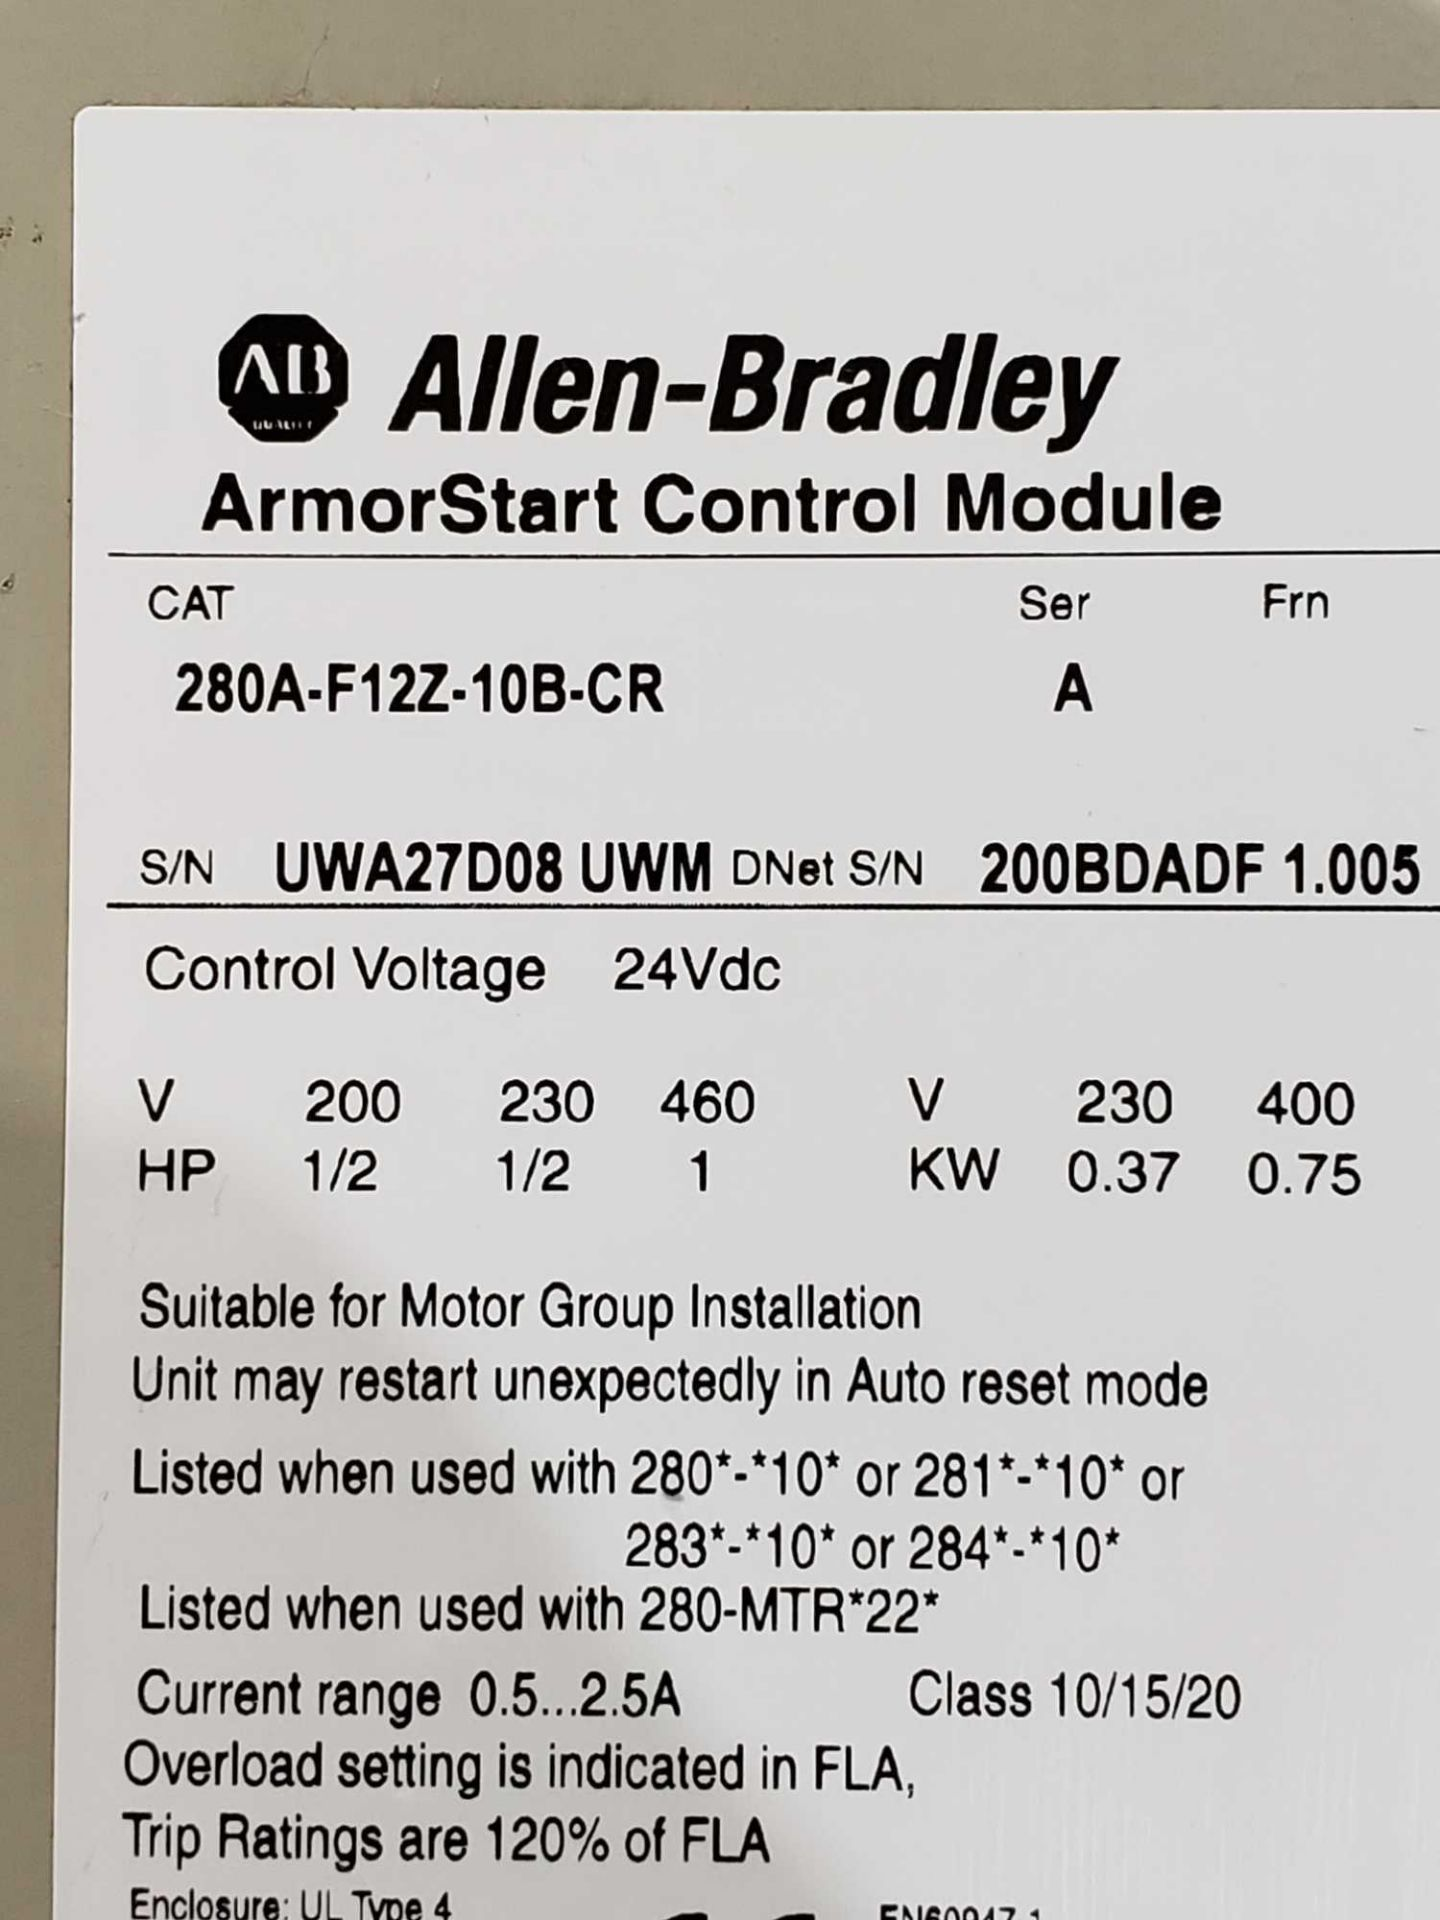 Lot 3 - Allen Bradley Armorstart Catalog 280A-F12Z-10B-CR with base Catalog 280D-FN-10-C.